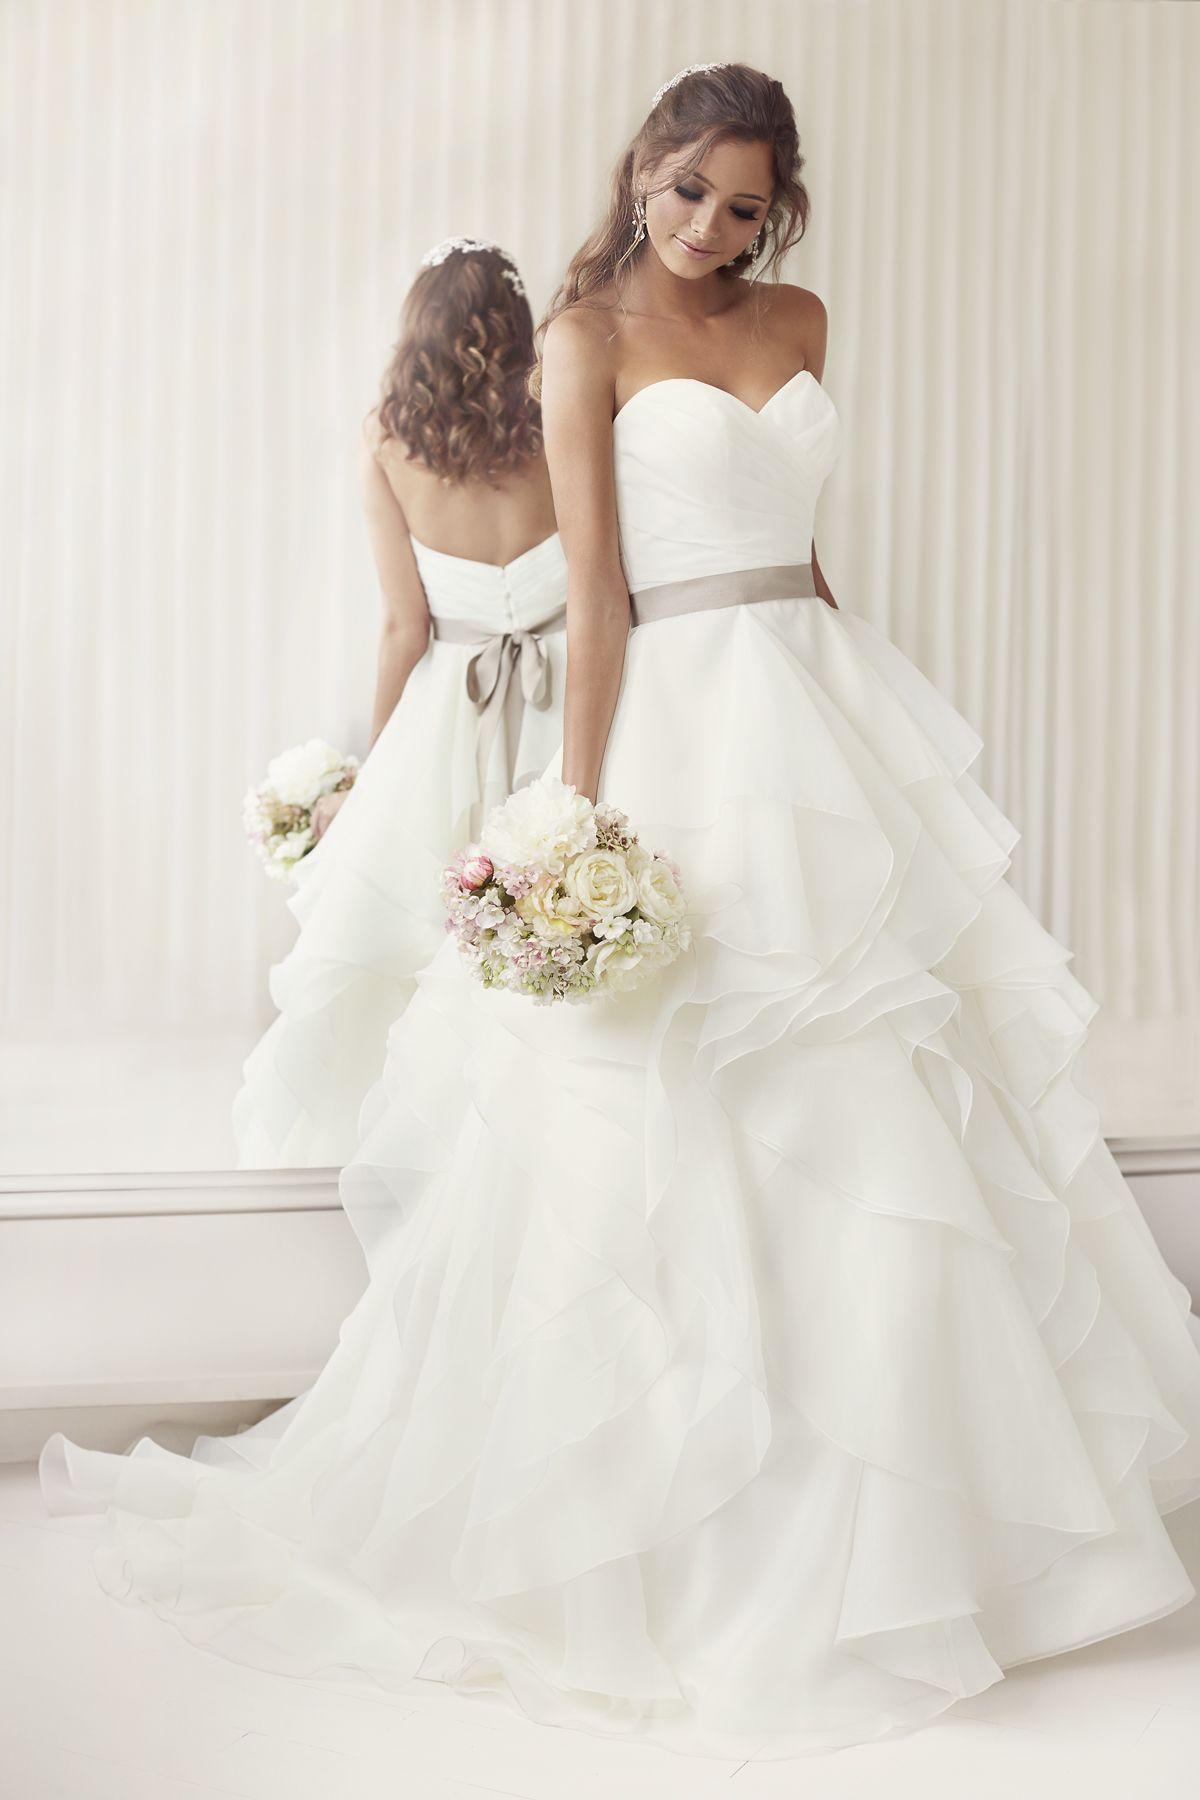 231198c1aaea Dress Wedding Dresses With Ruffles, Wedding Dress With Belt, Vera Wang  Wedding Dresses,